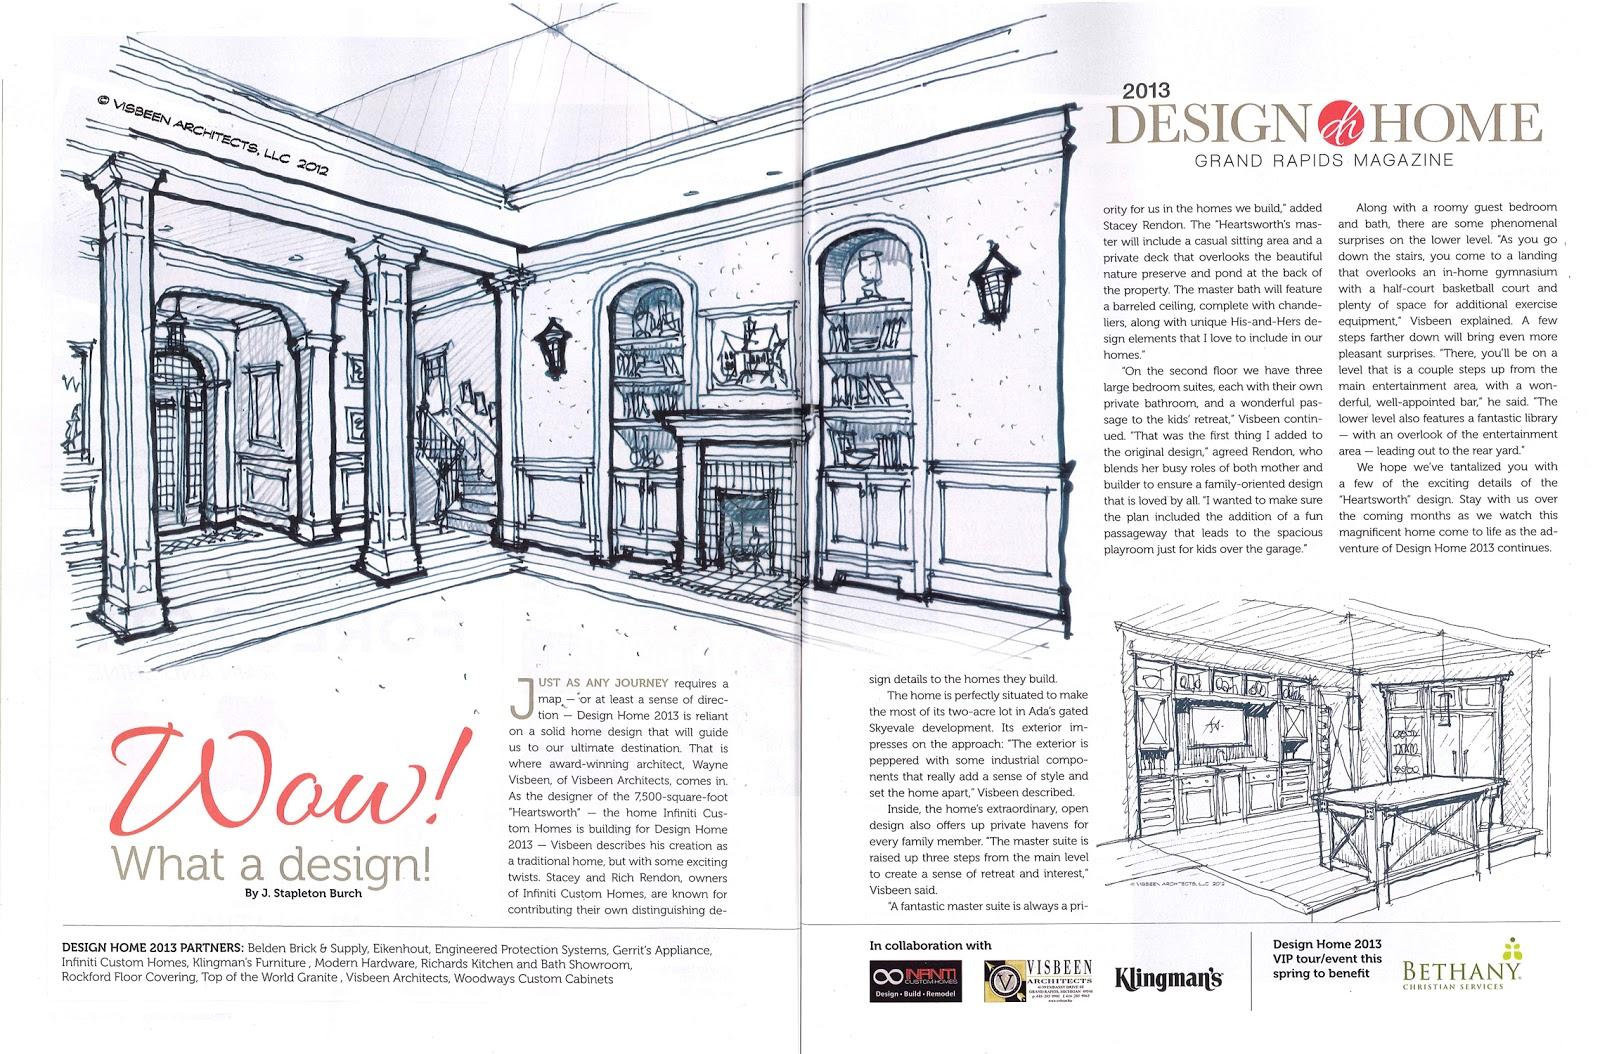 Grand Rapids Magazine Design Home 2013: Wow! What a design ...